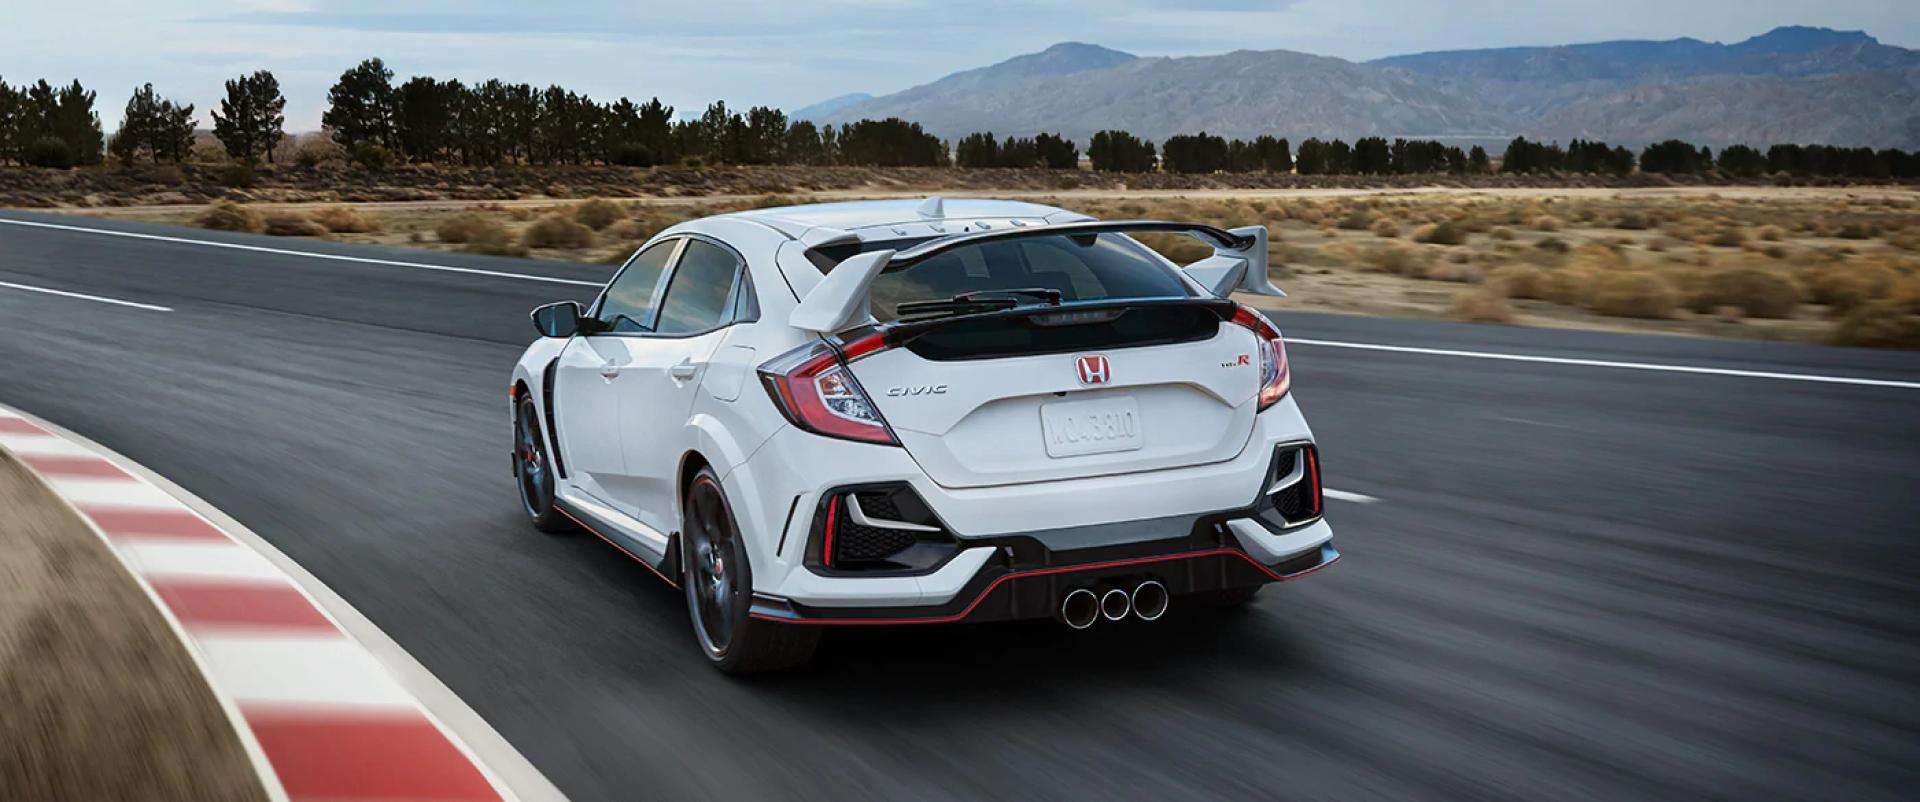 Honda_Civic_Type_R_Championship_White_Driving_Rear_View